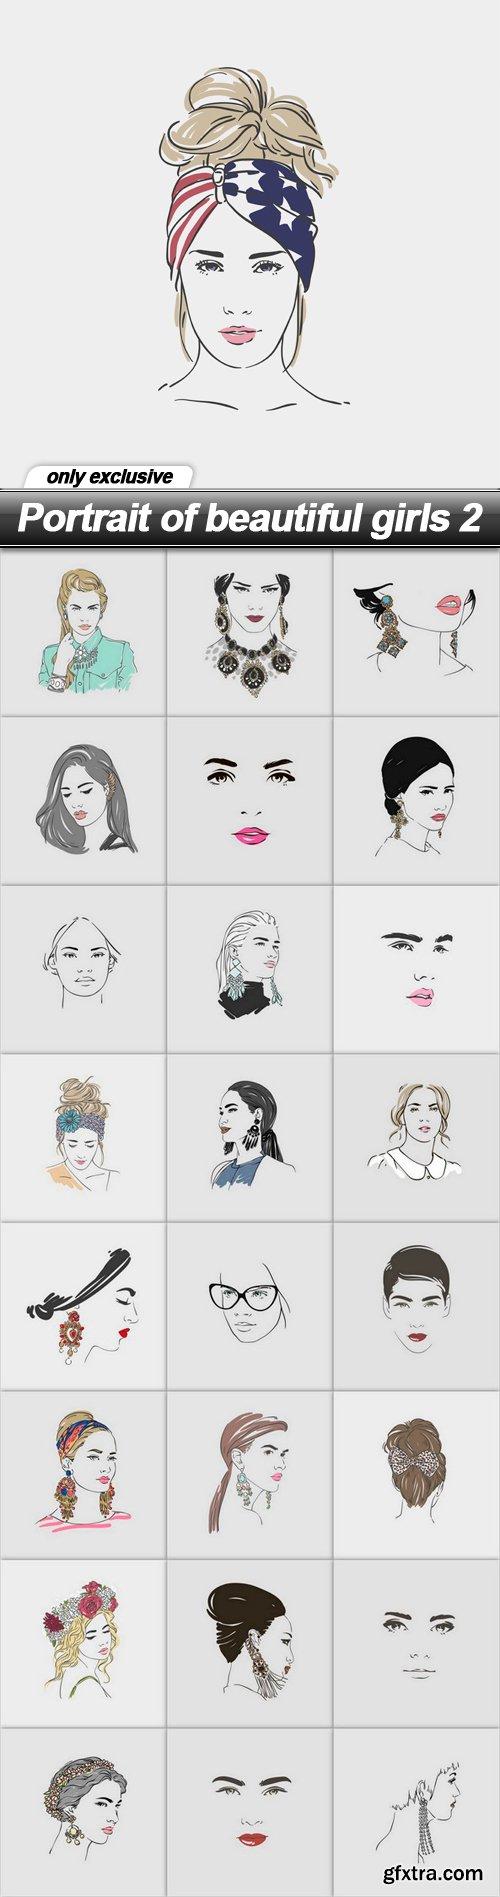 Portrait of beautiful girls 2 - 25 EPS